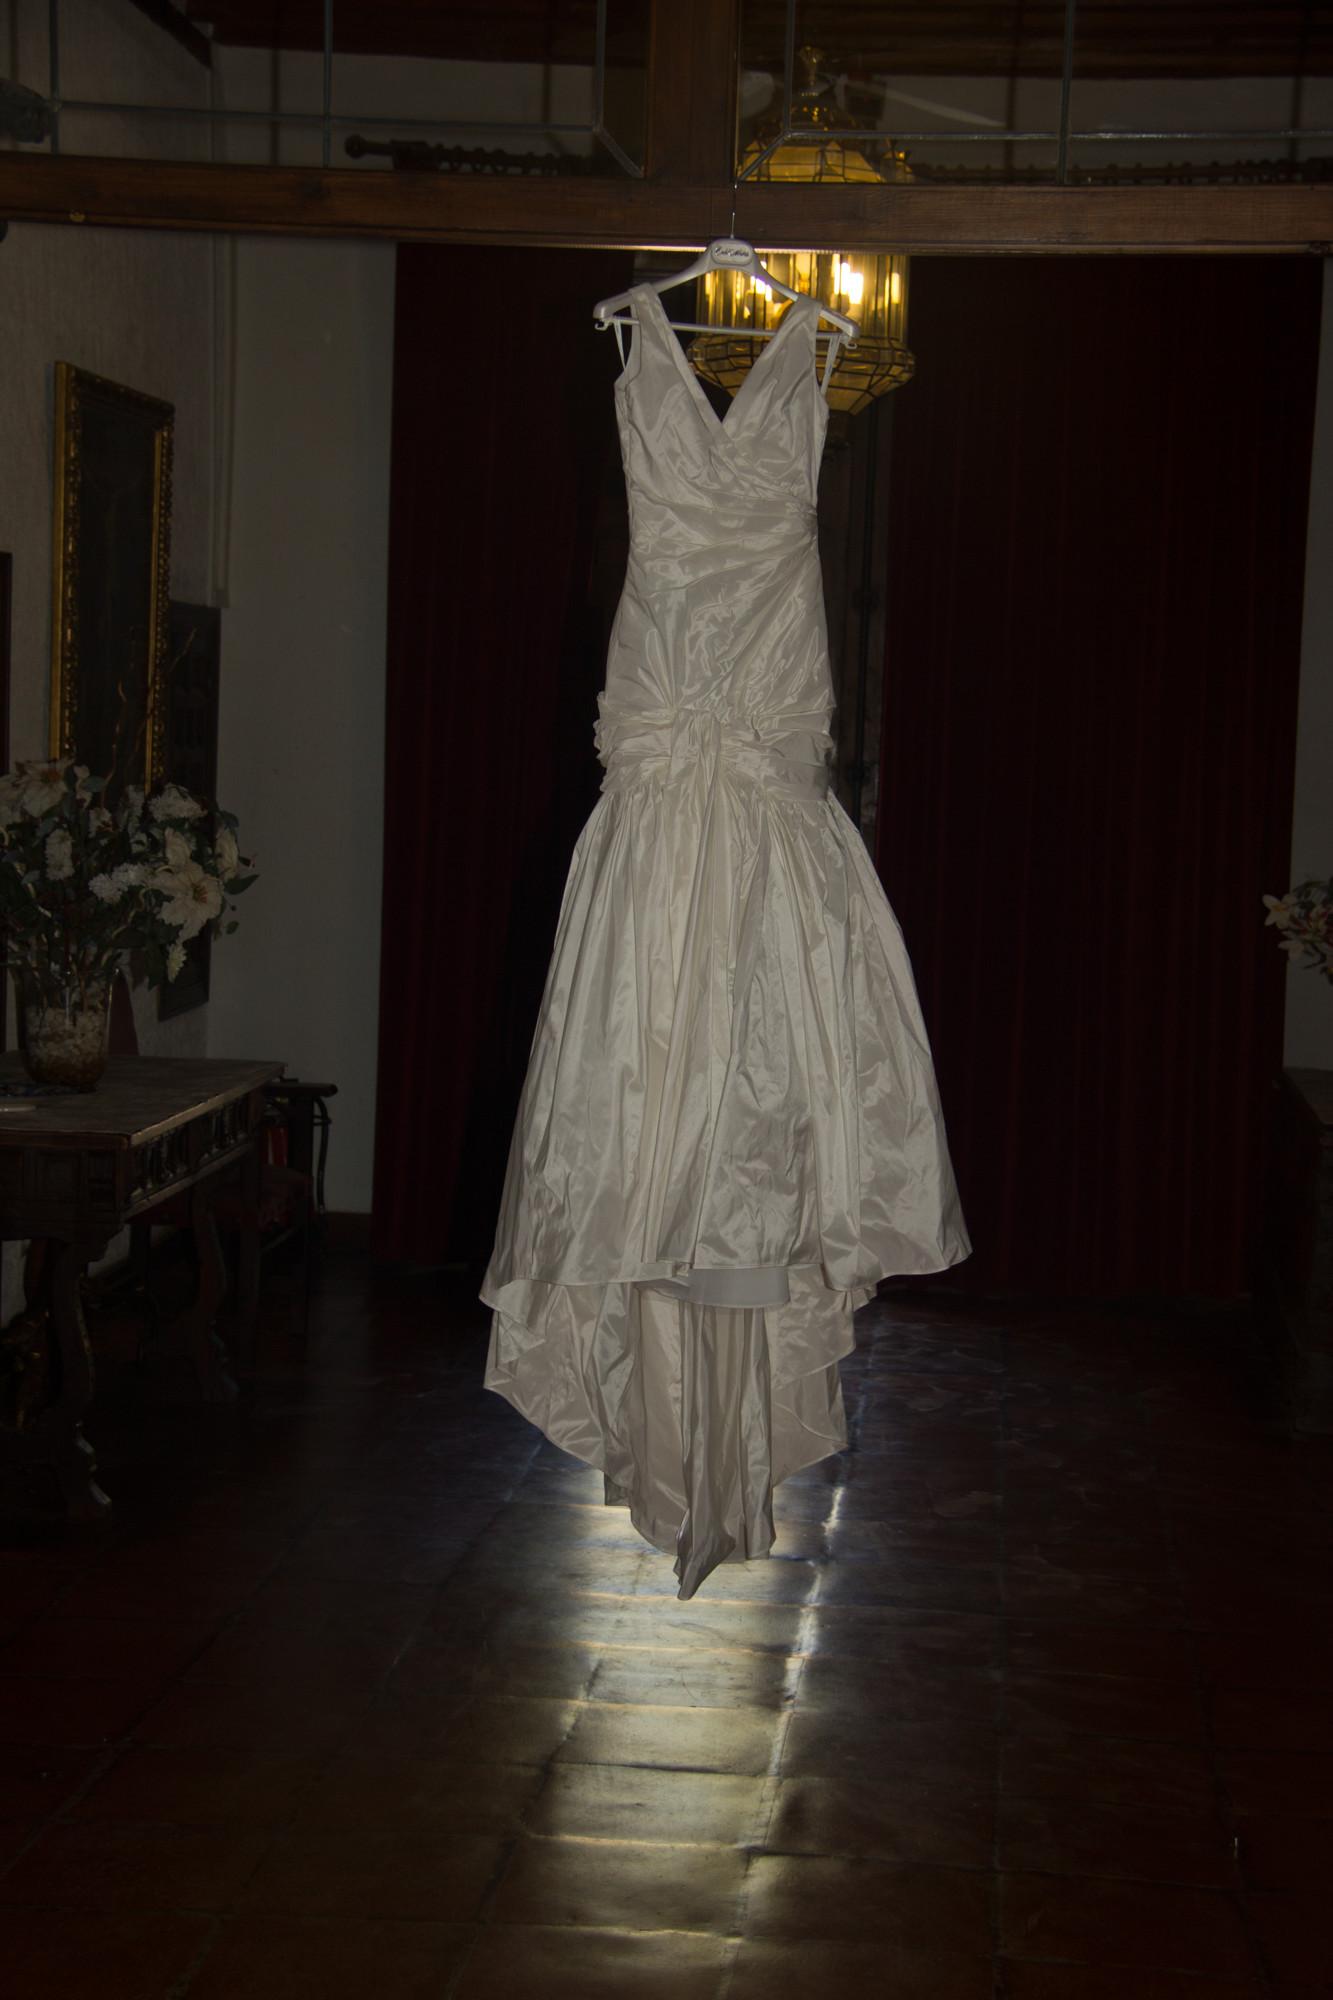 2.- Vestido